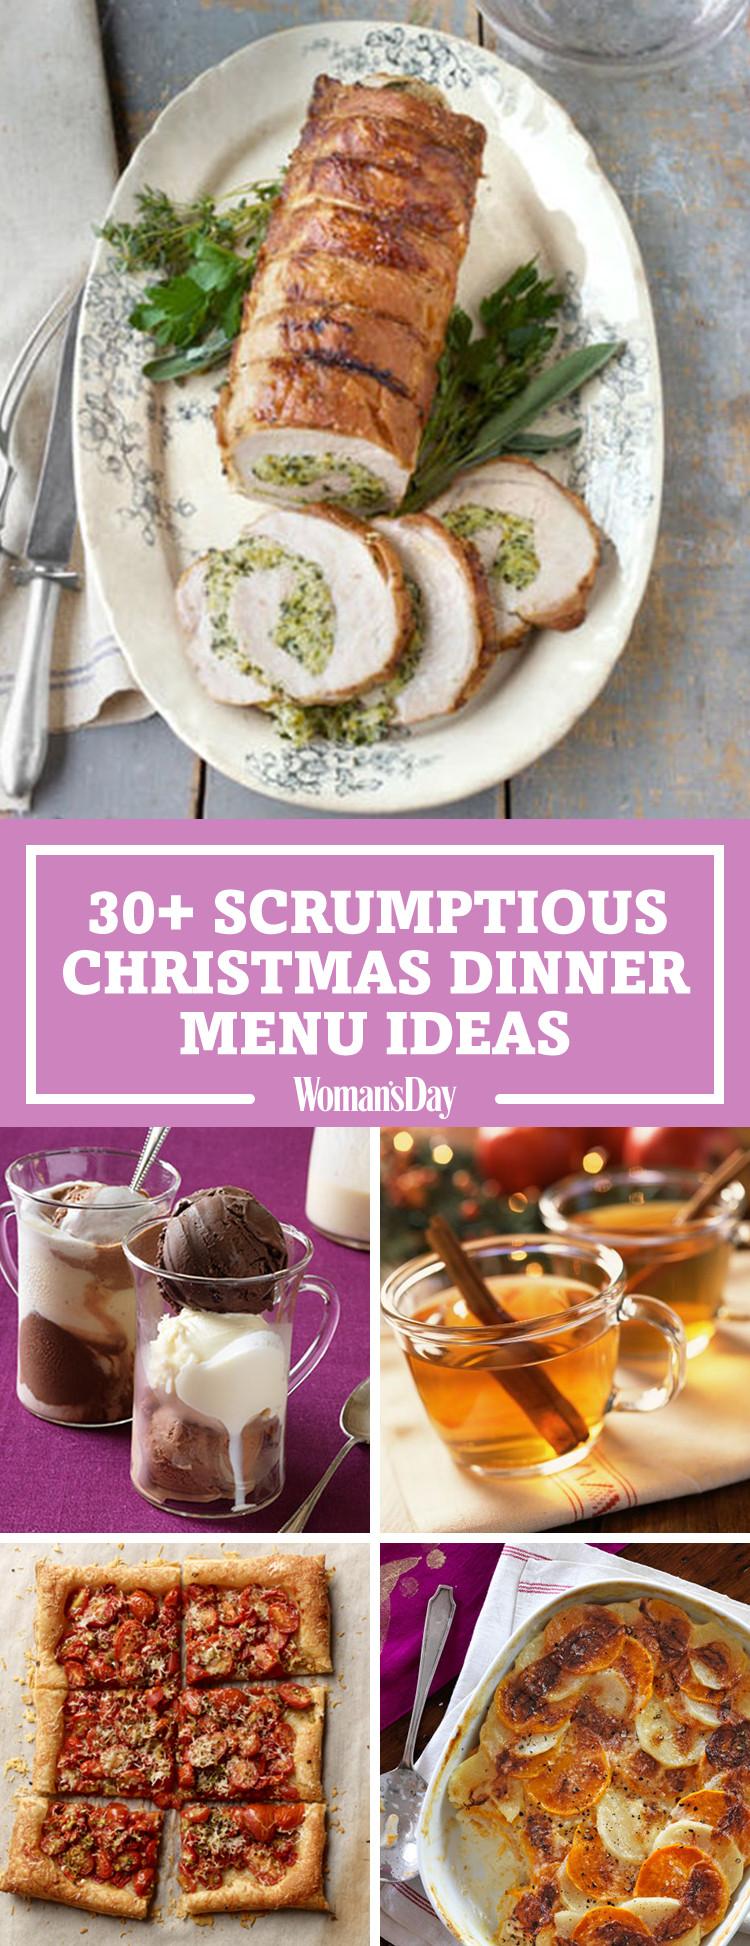 Menus For Christmas Dinners  Best Christmas Dinner Menu Ideas for 2017